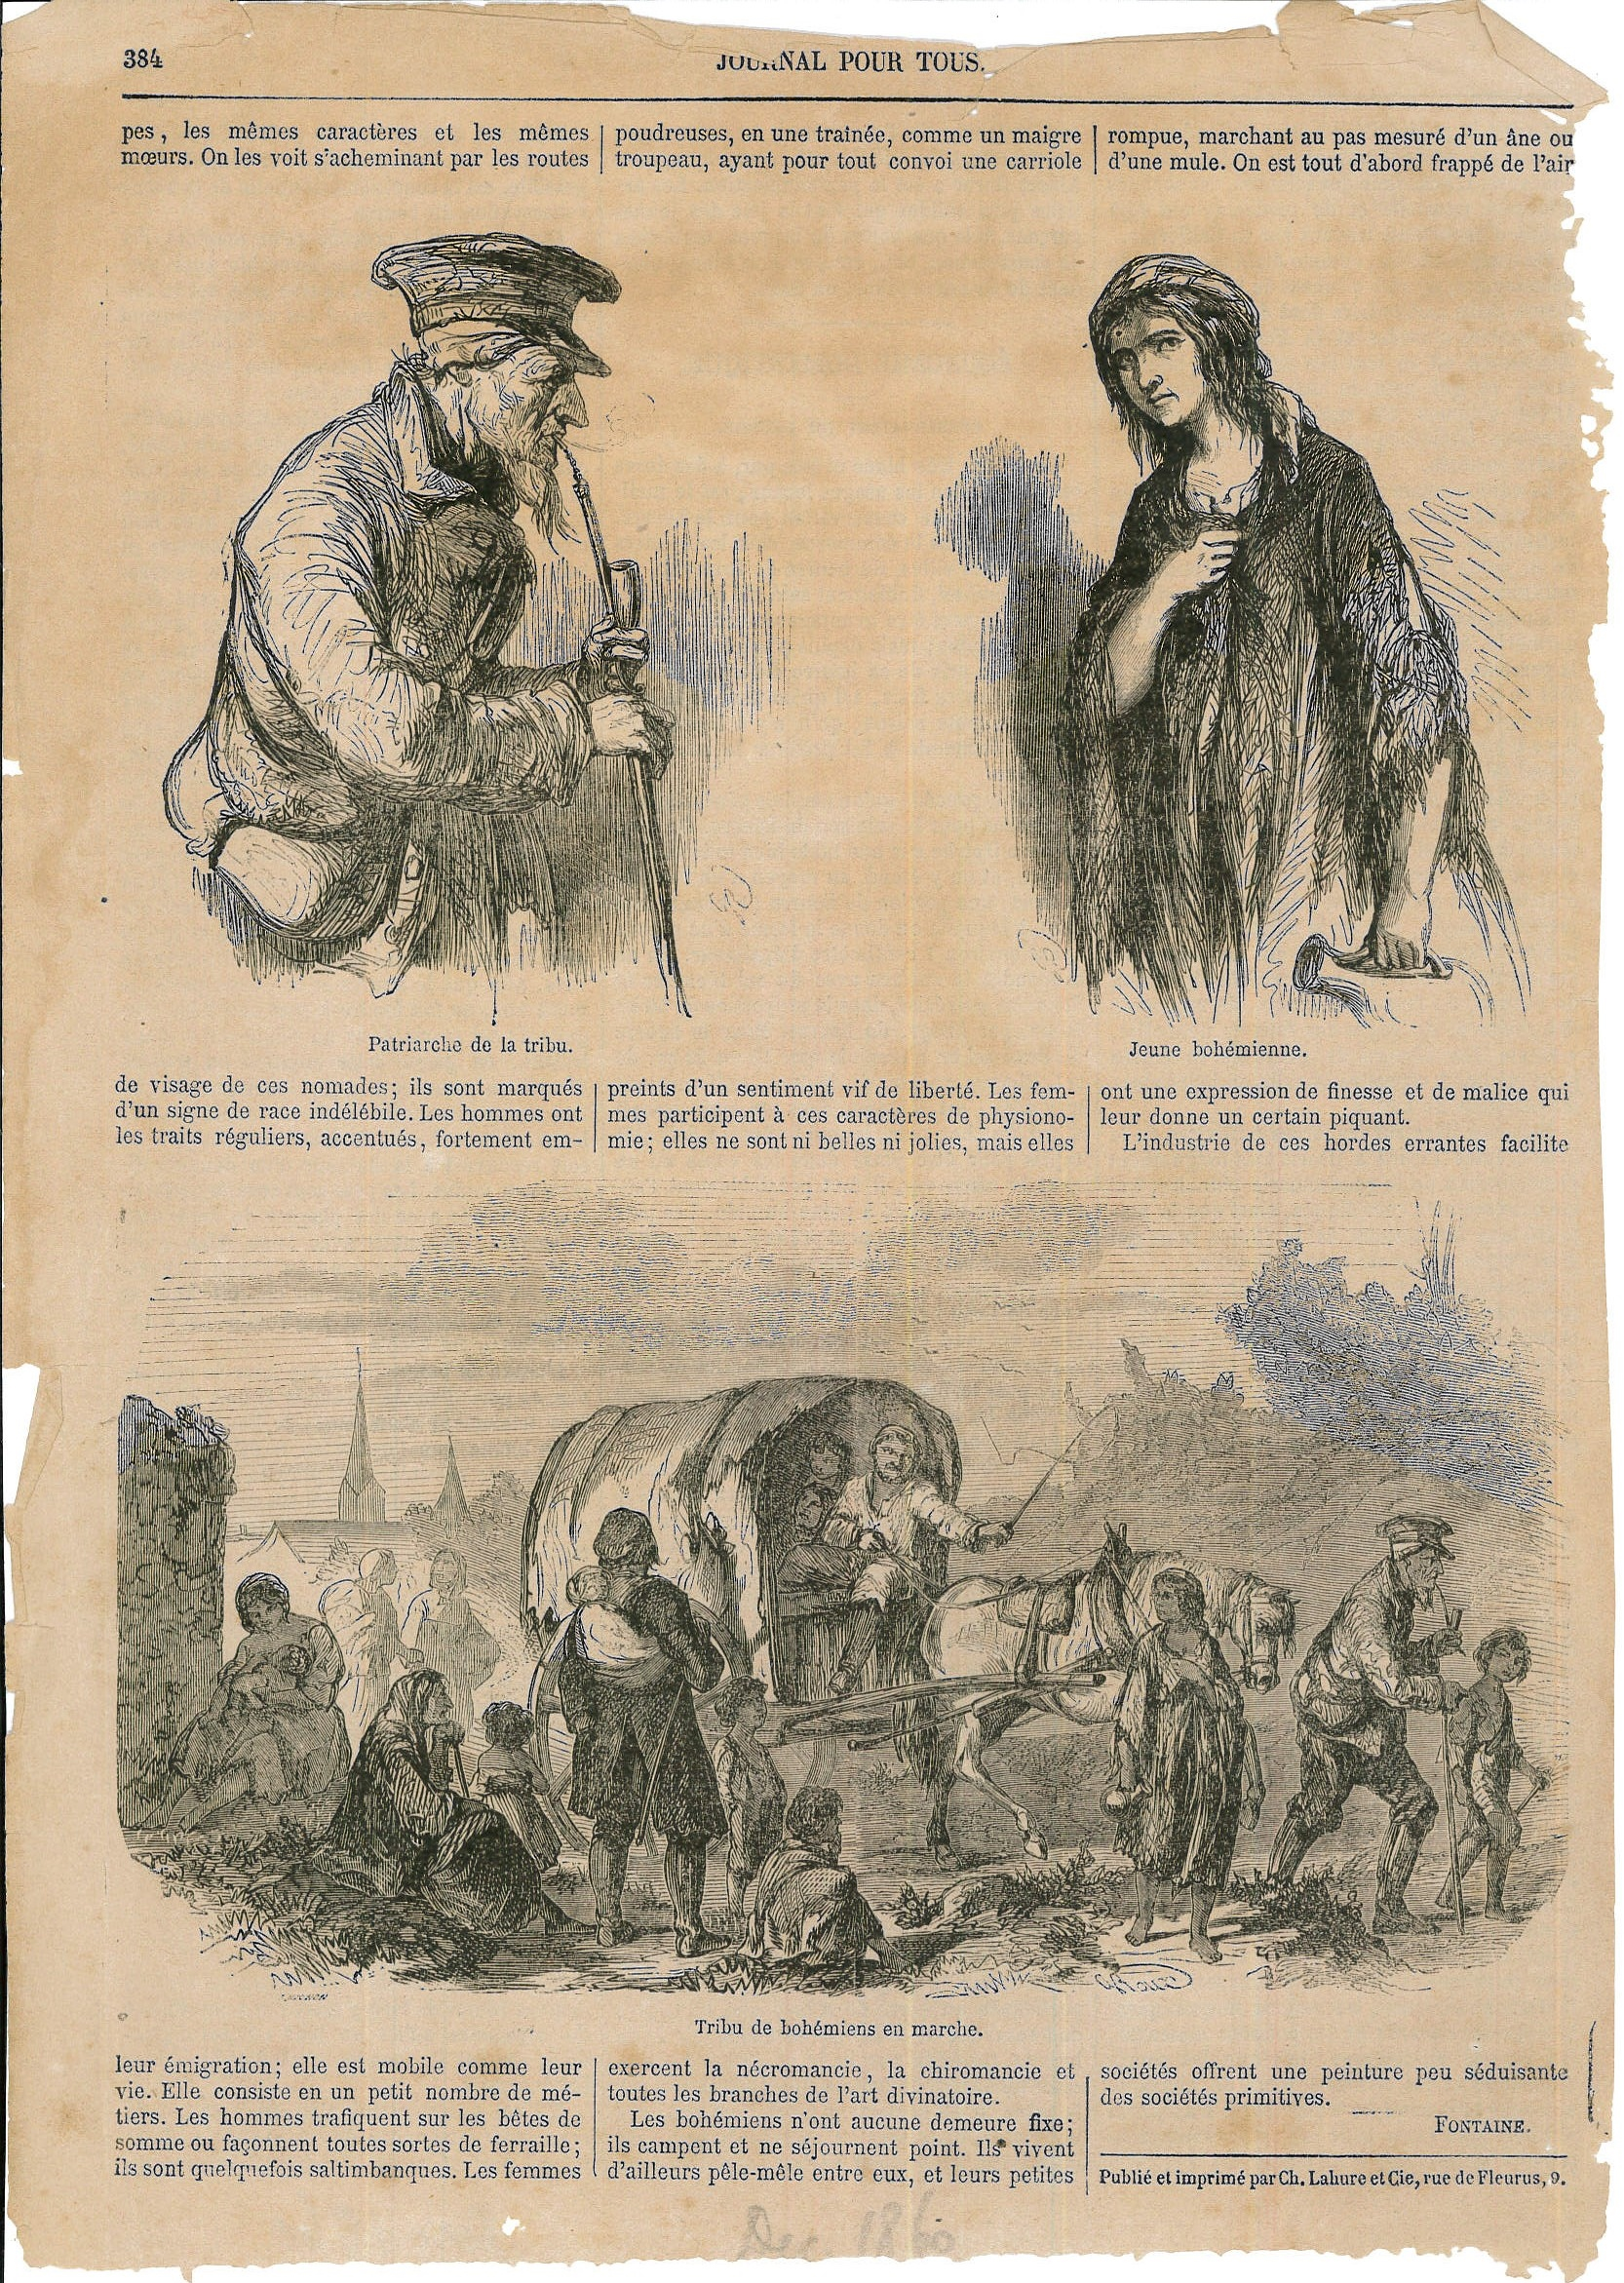 1860_12_p.384.jpg - image/jpeg